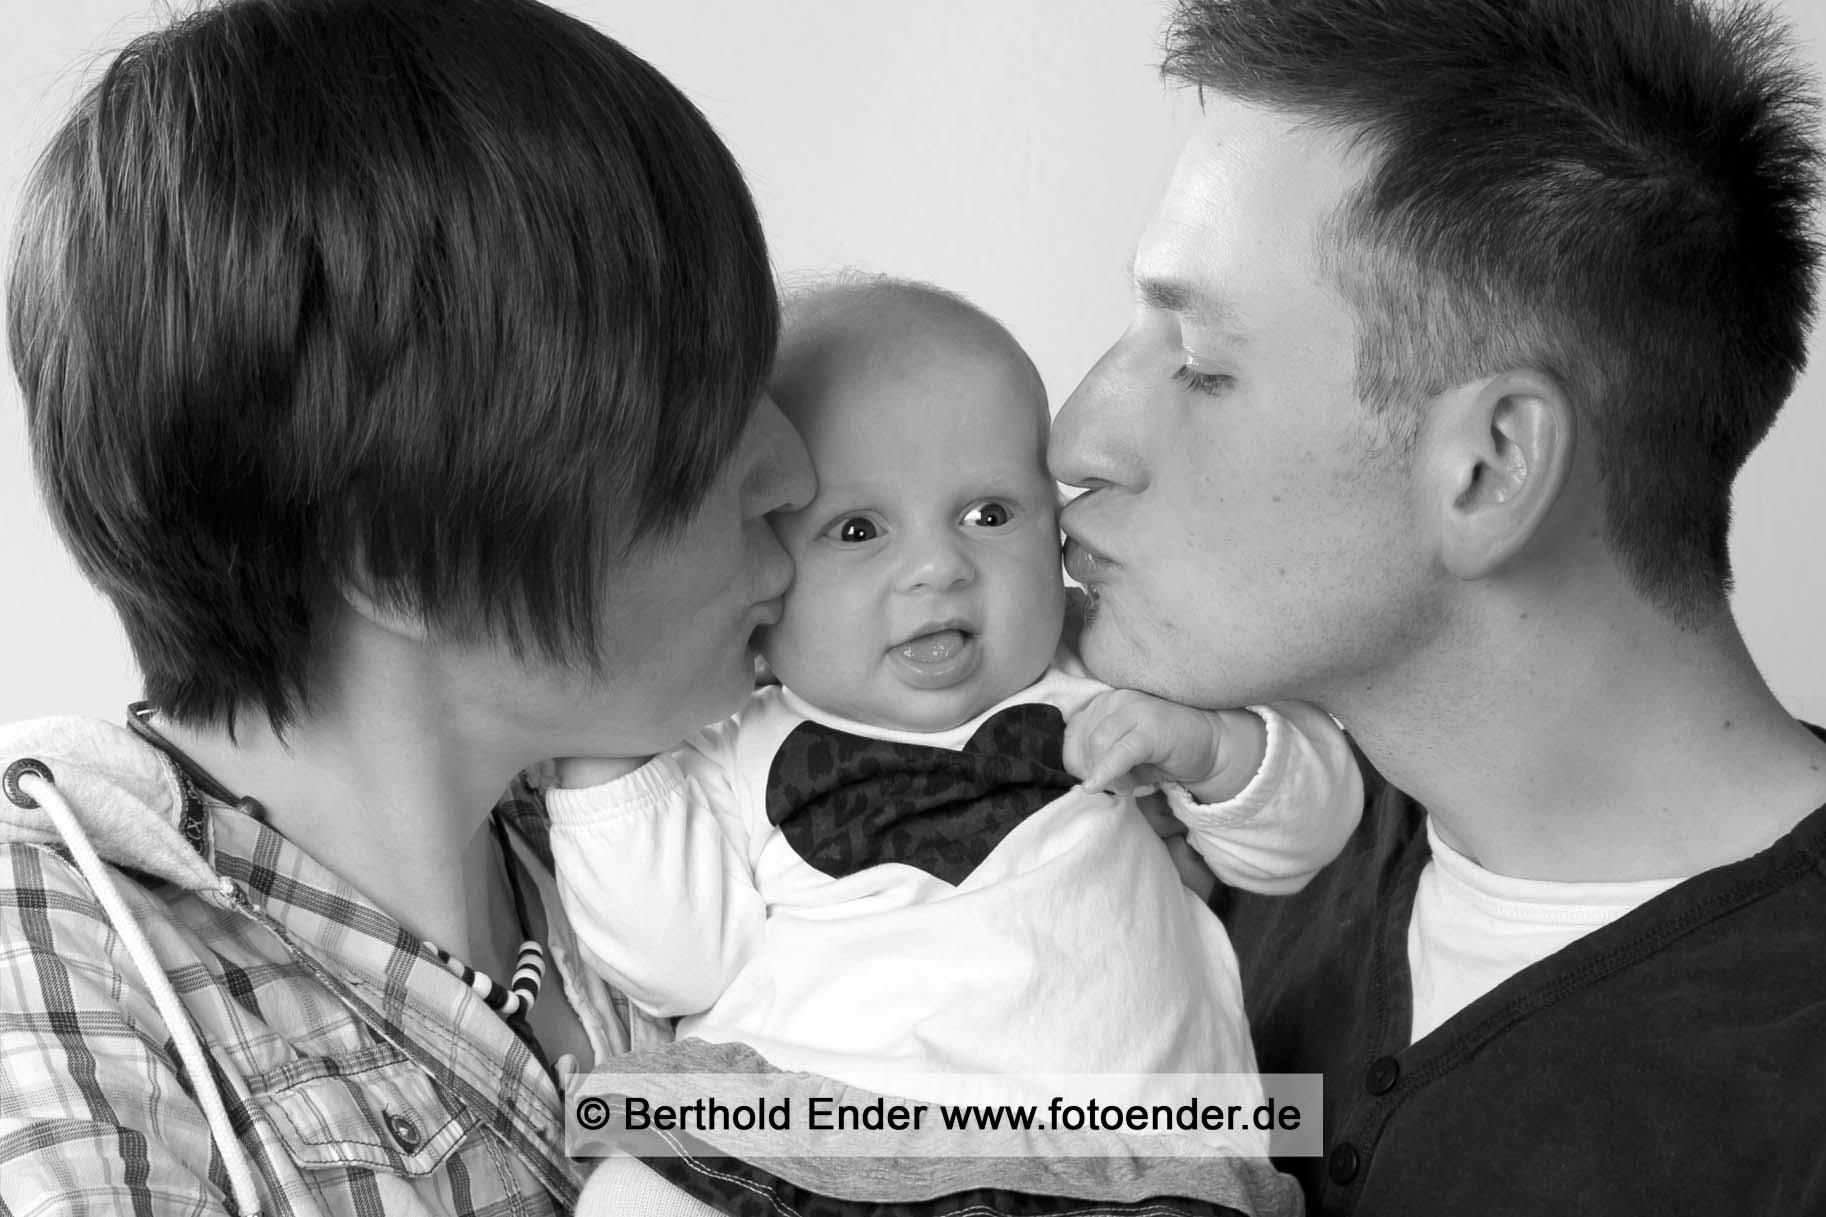 Familienfotos- Fotostudio Ender Oranienbaum-Wörlitz